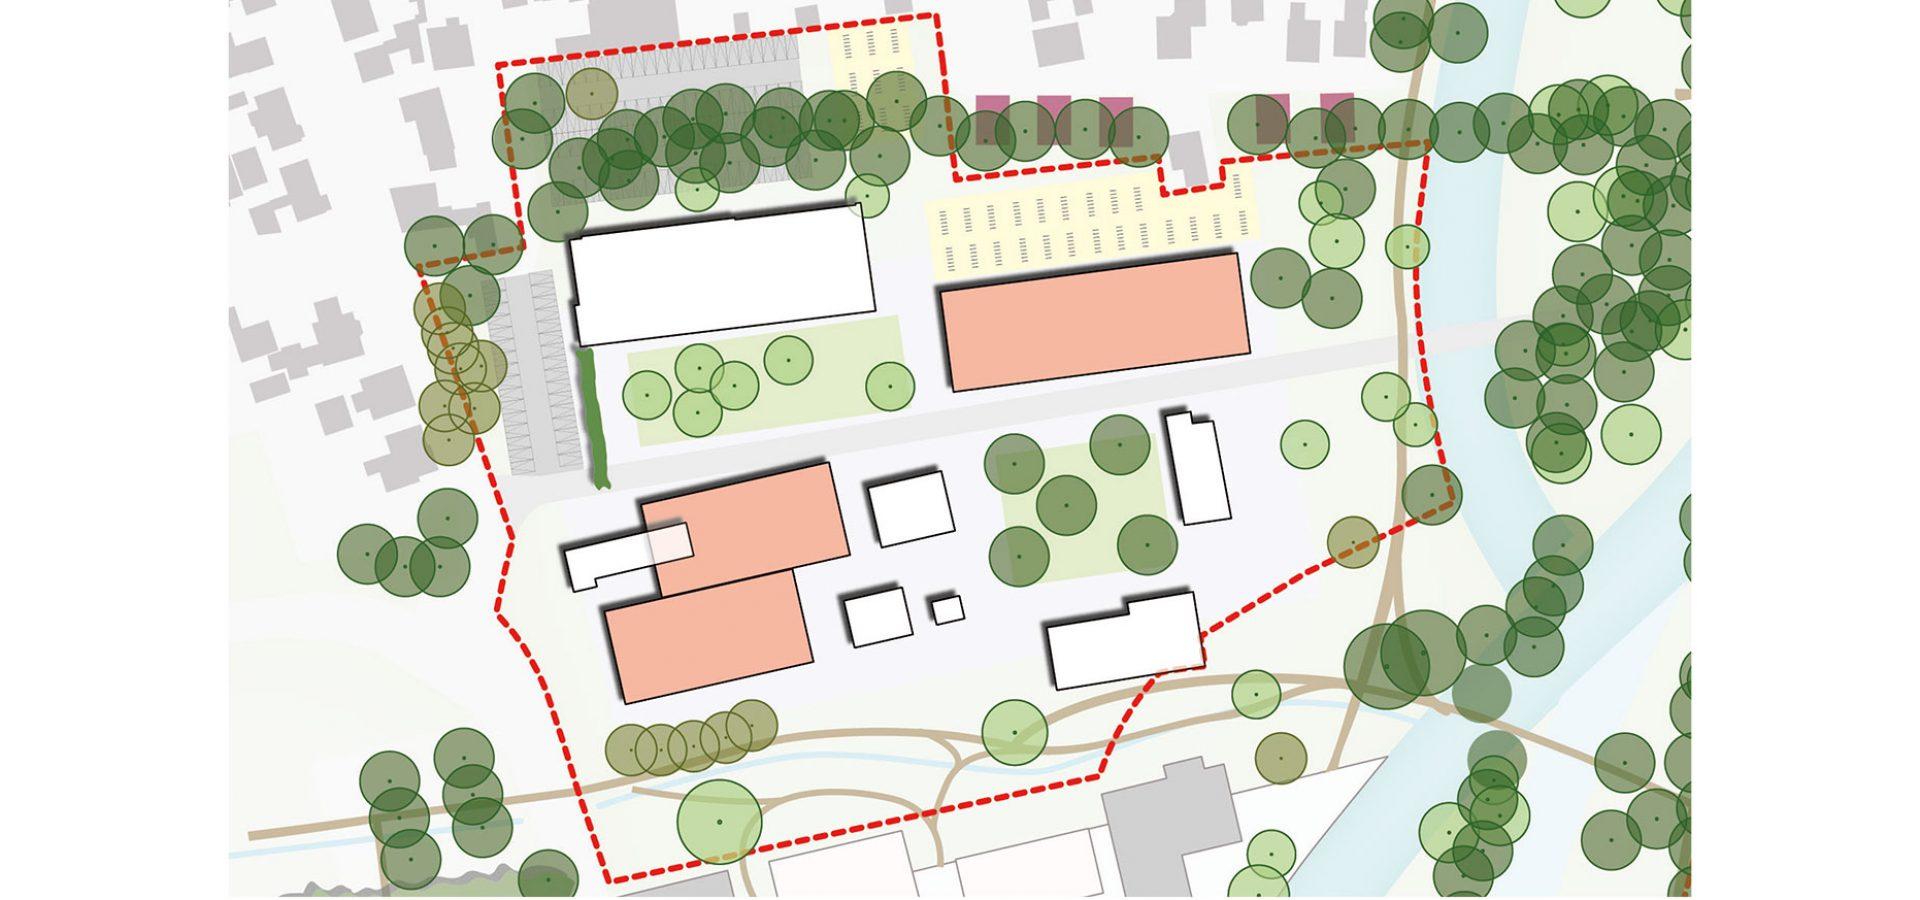 FARO architecten Reggesteyn aan de Regge Nijverdal 05